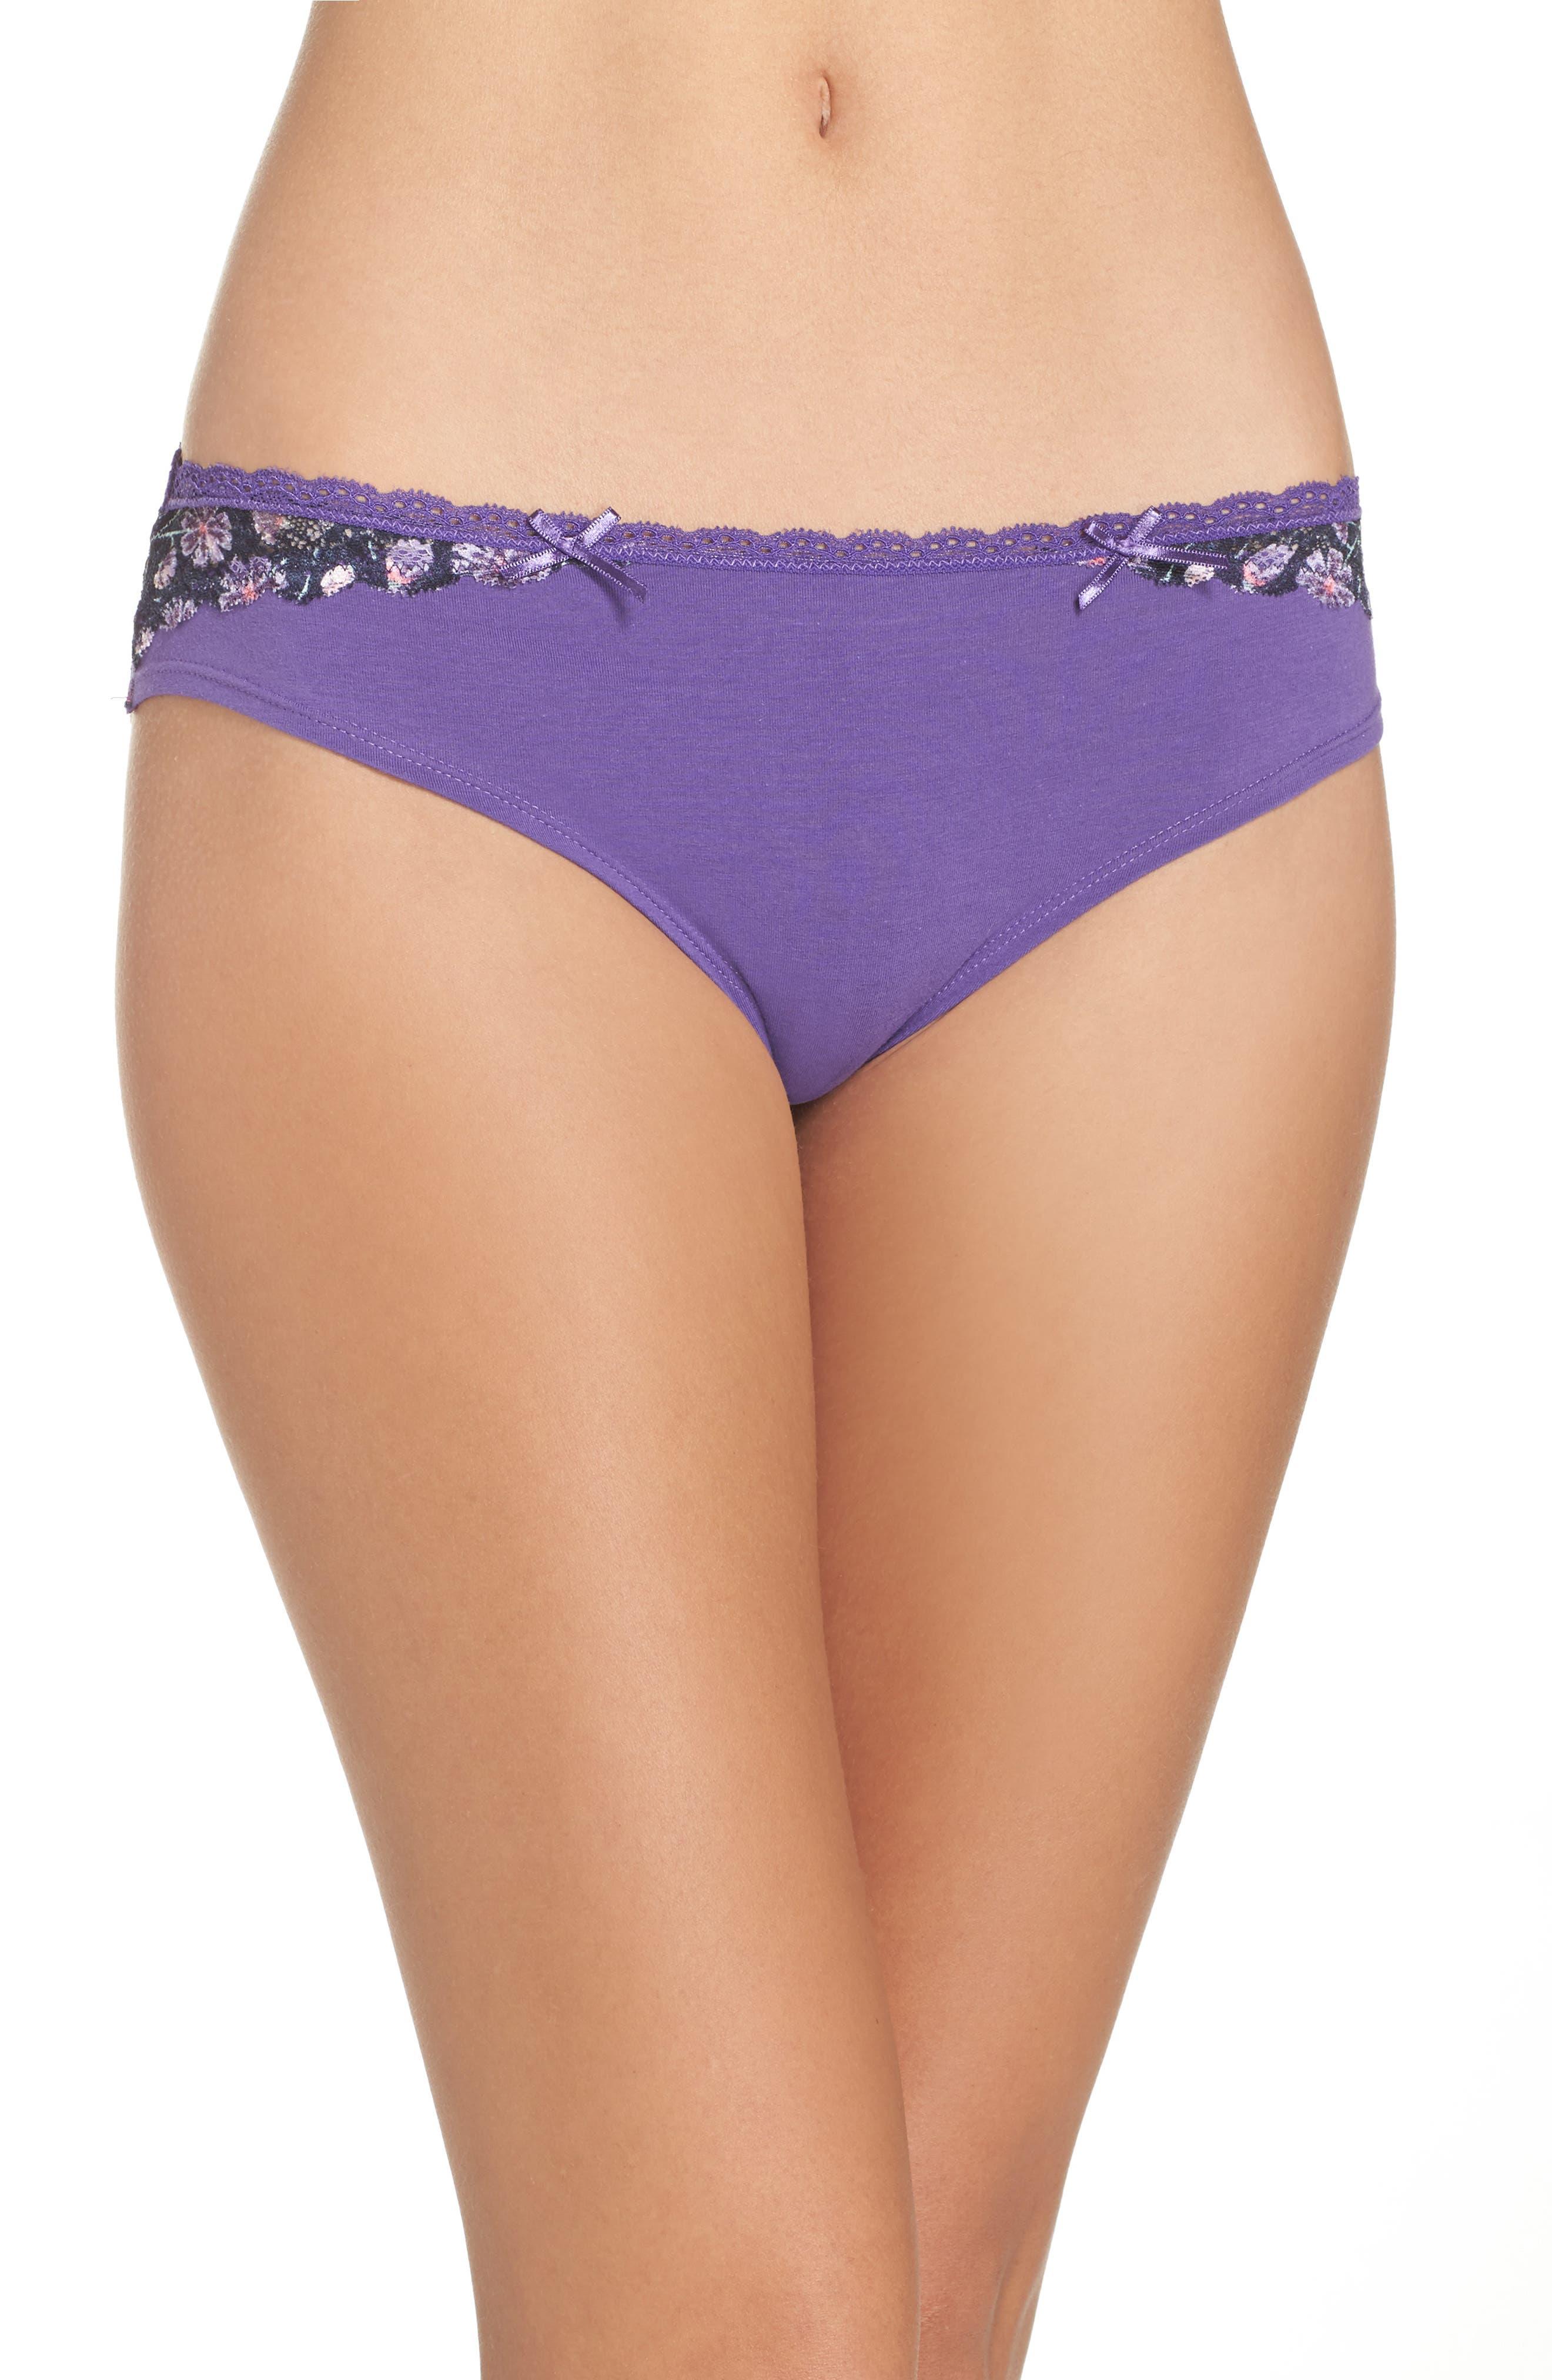 h.dew Becca Bikini (Regular & Plus Size) (5 for $30)